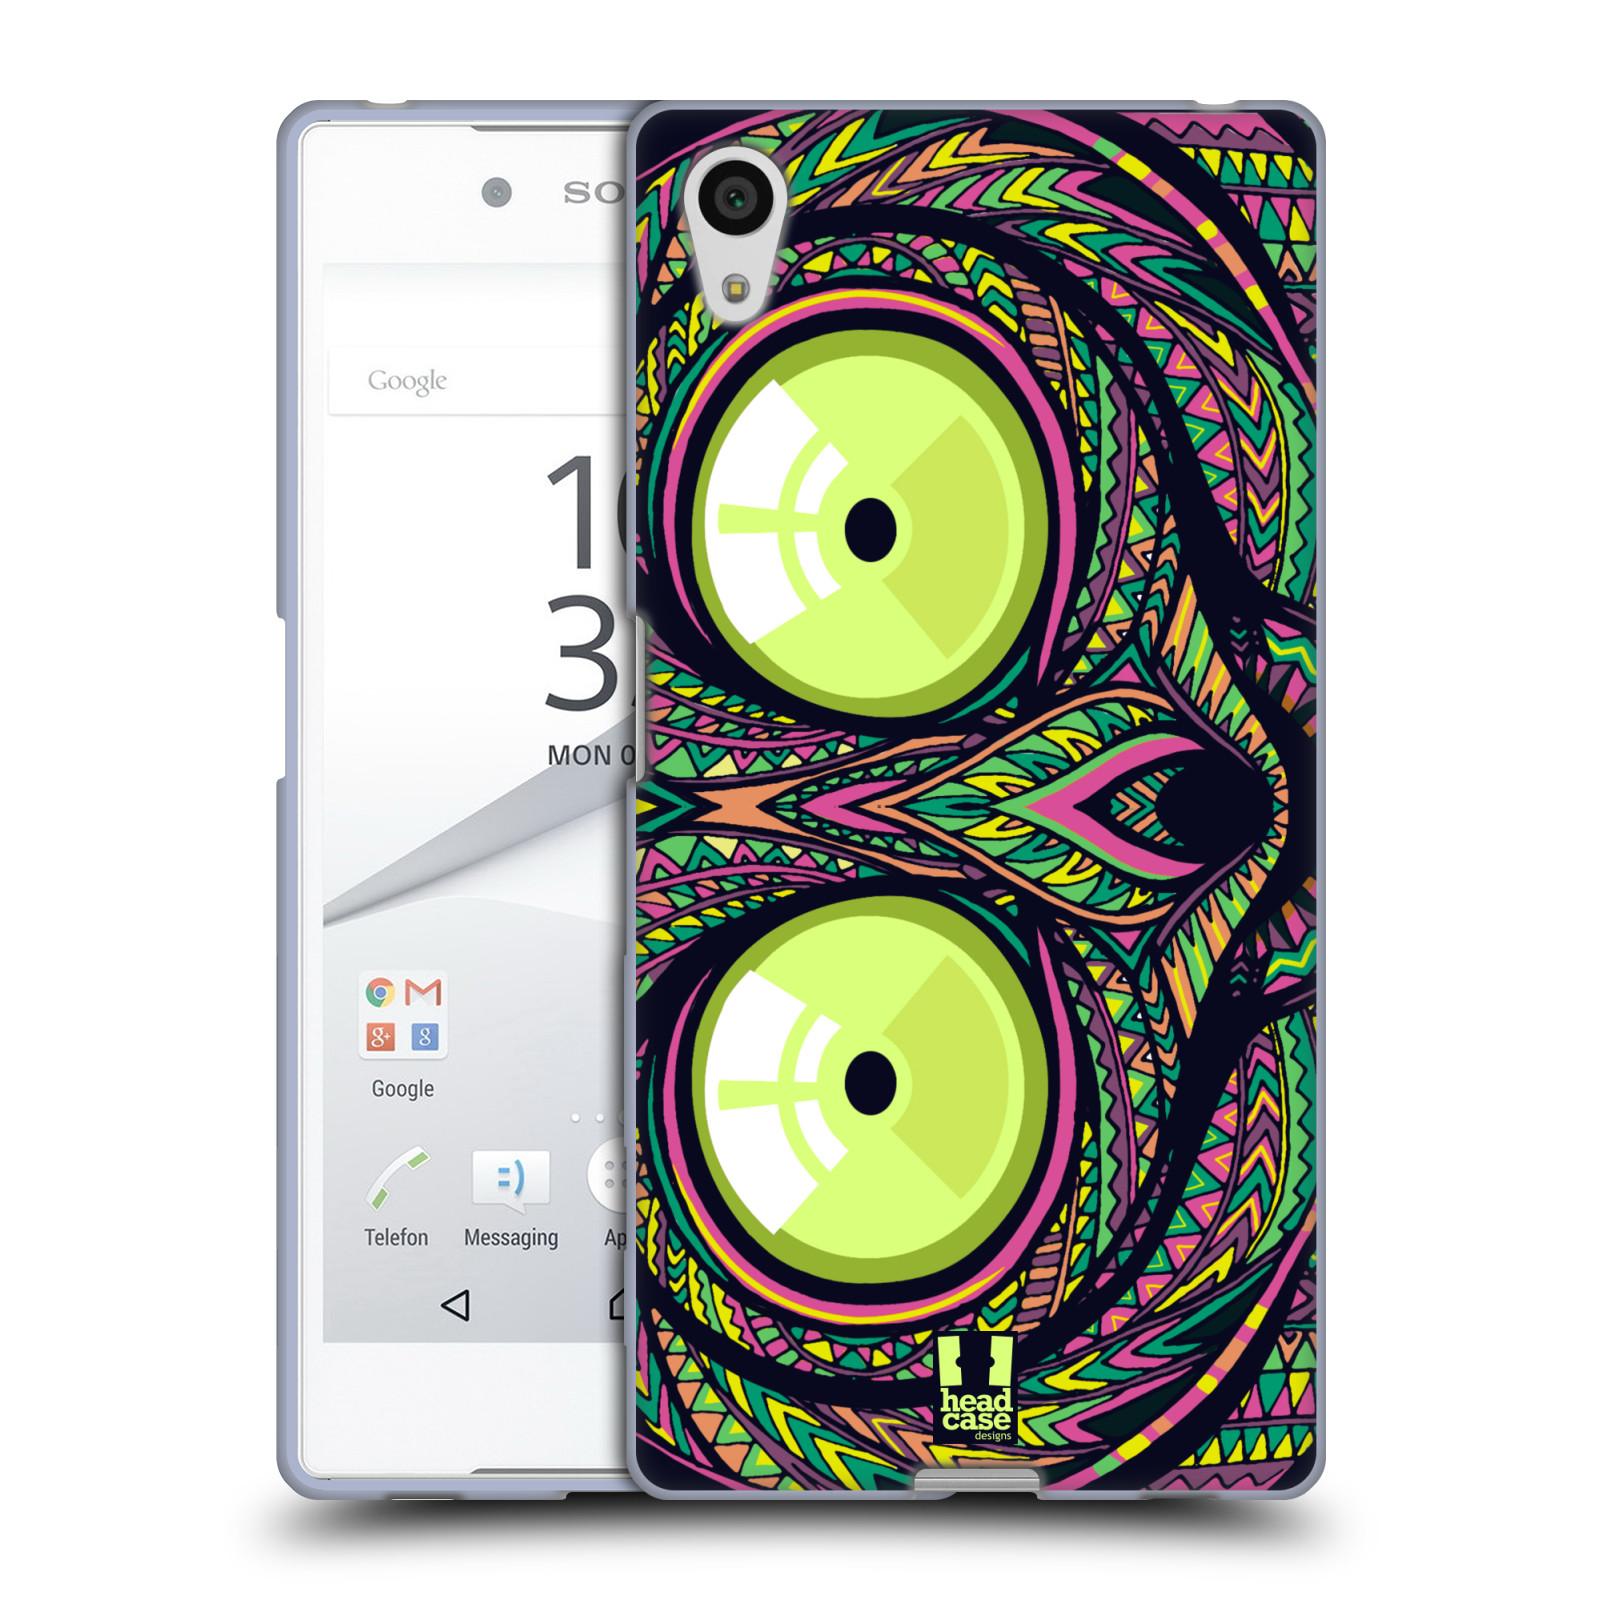 Silikonové pouzdro na mobil Sony Xperia Z5 HEAD CASE AZTEC NÁRTOUN